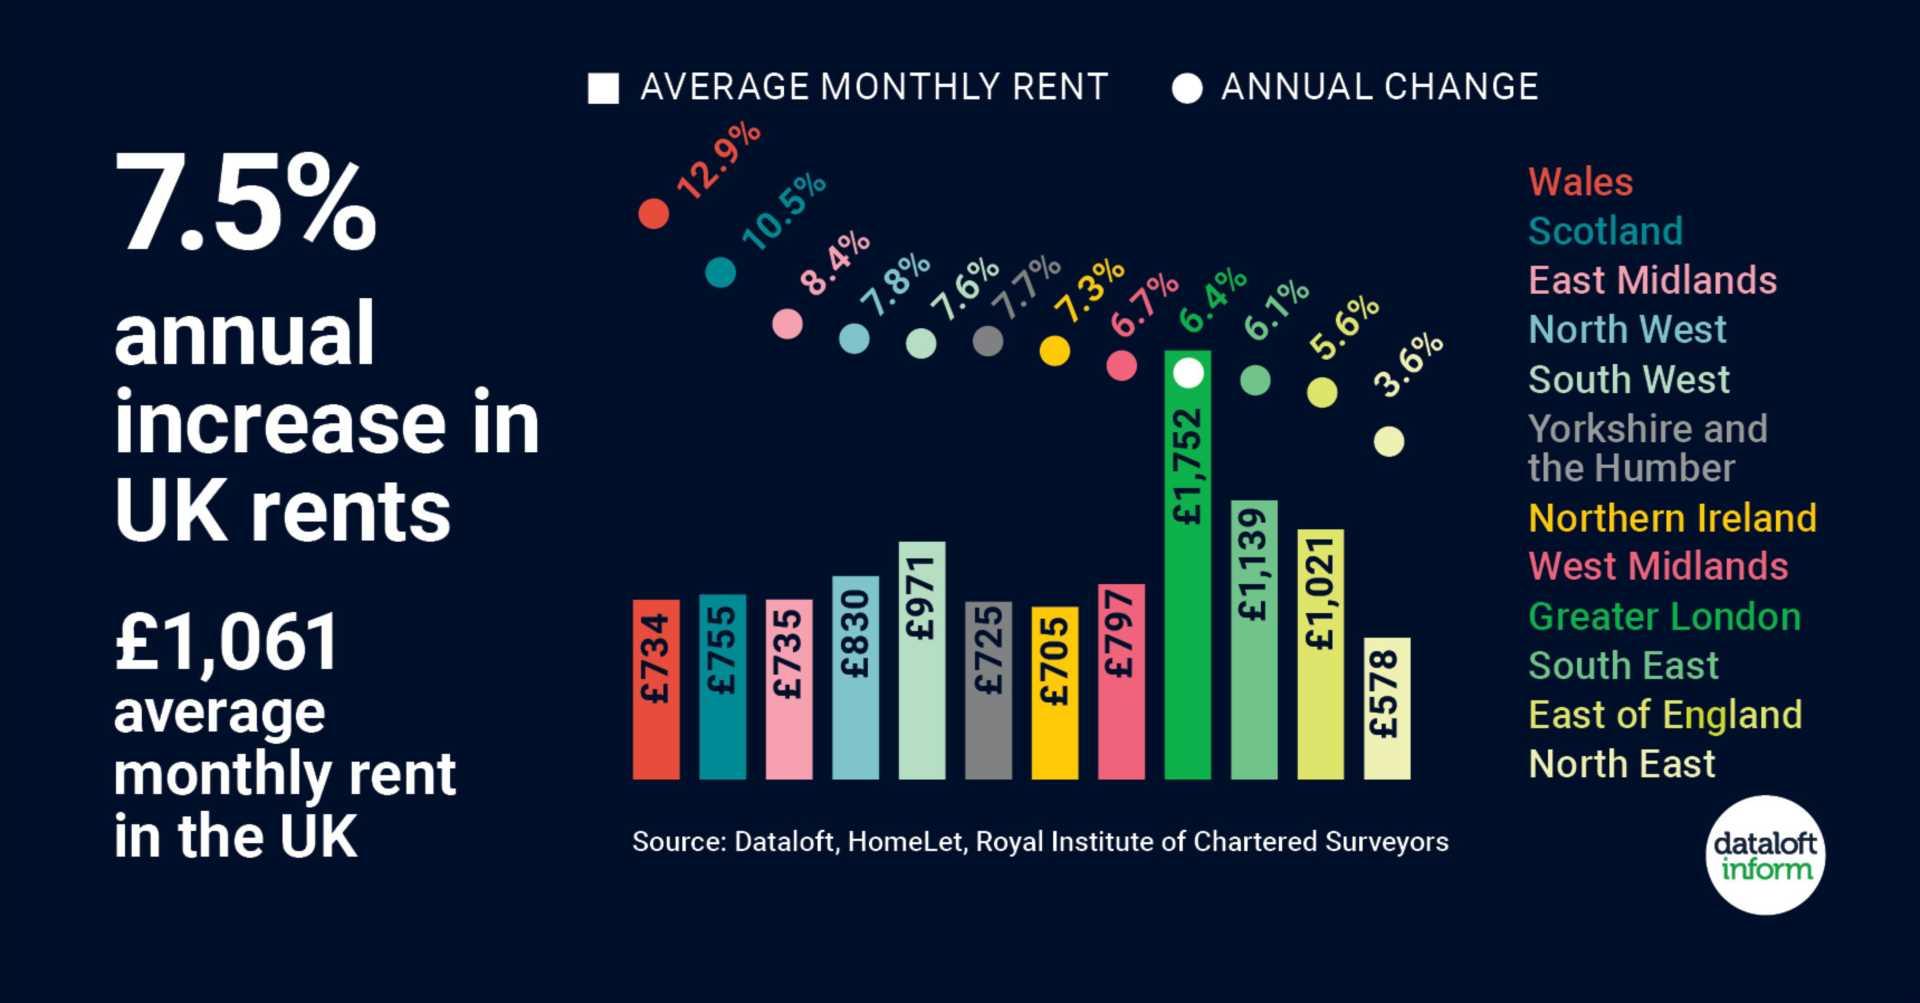 Increase In UK Rents